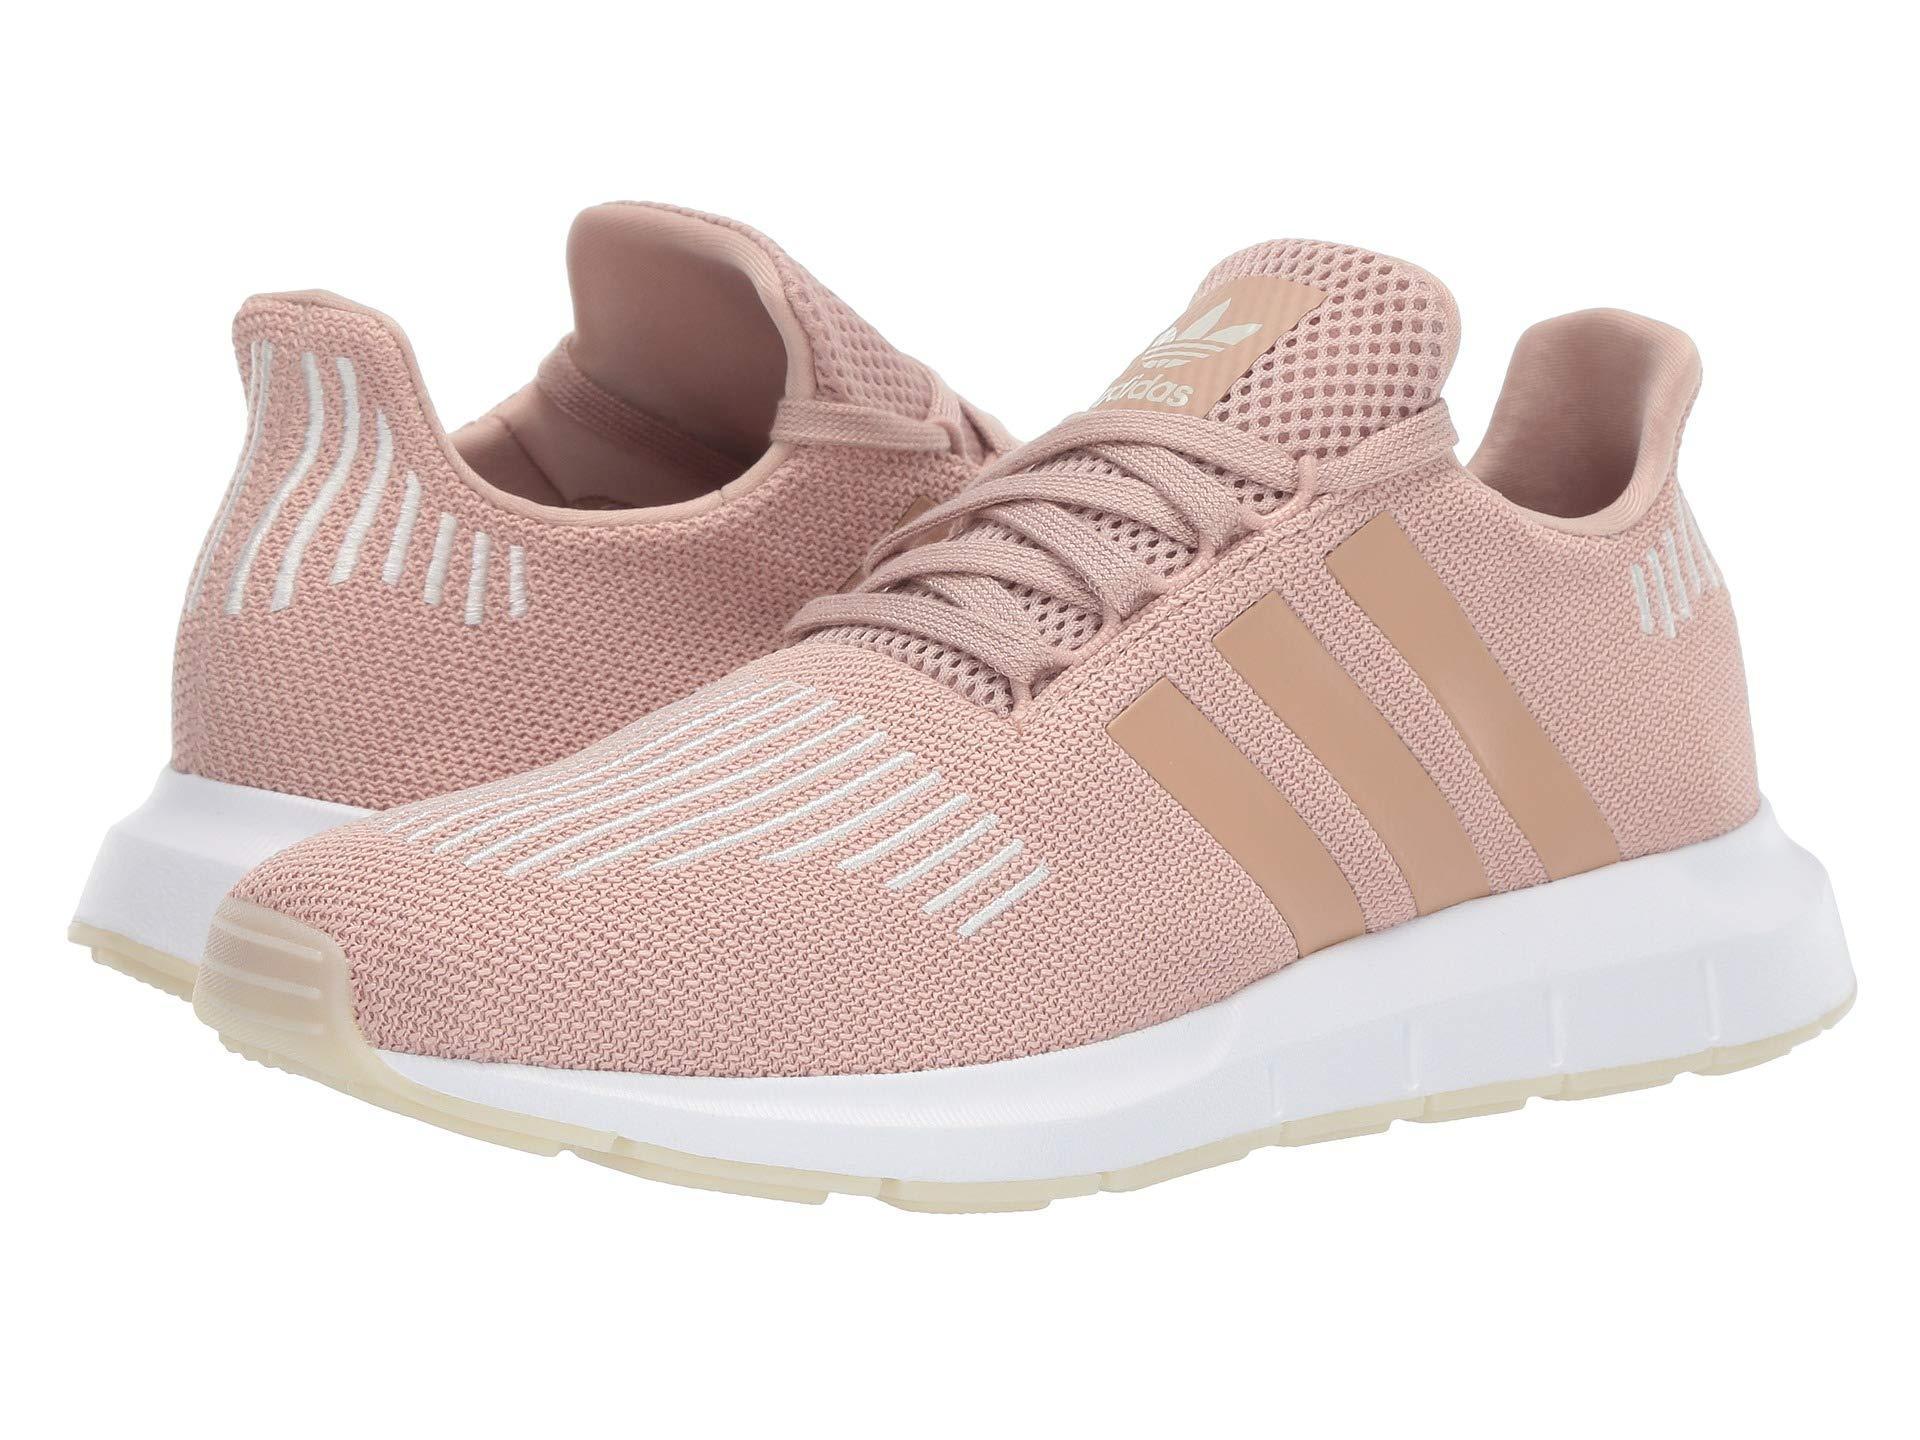 b0ef06eb9b3a6 Lyst - adidas Originals Swift Run W (ice Mint off-white footwear ...